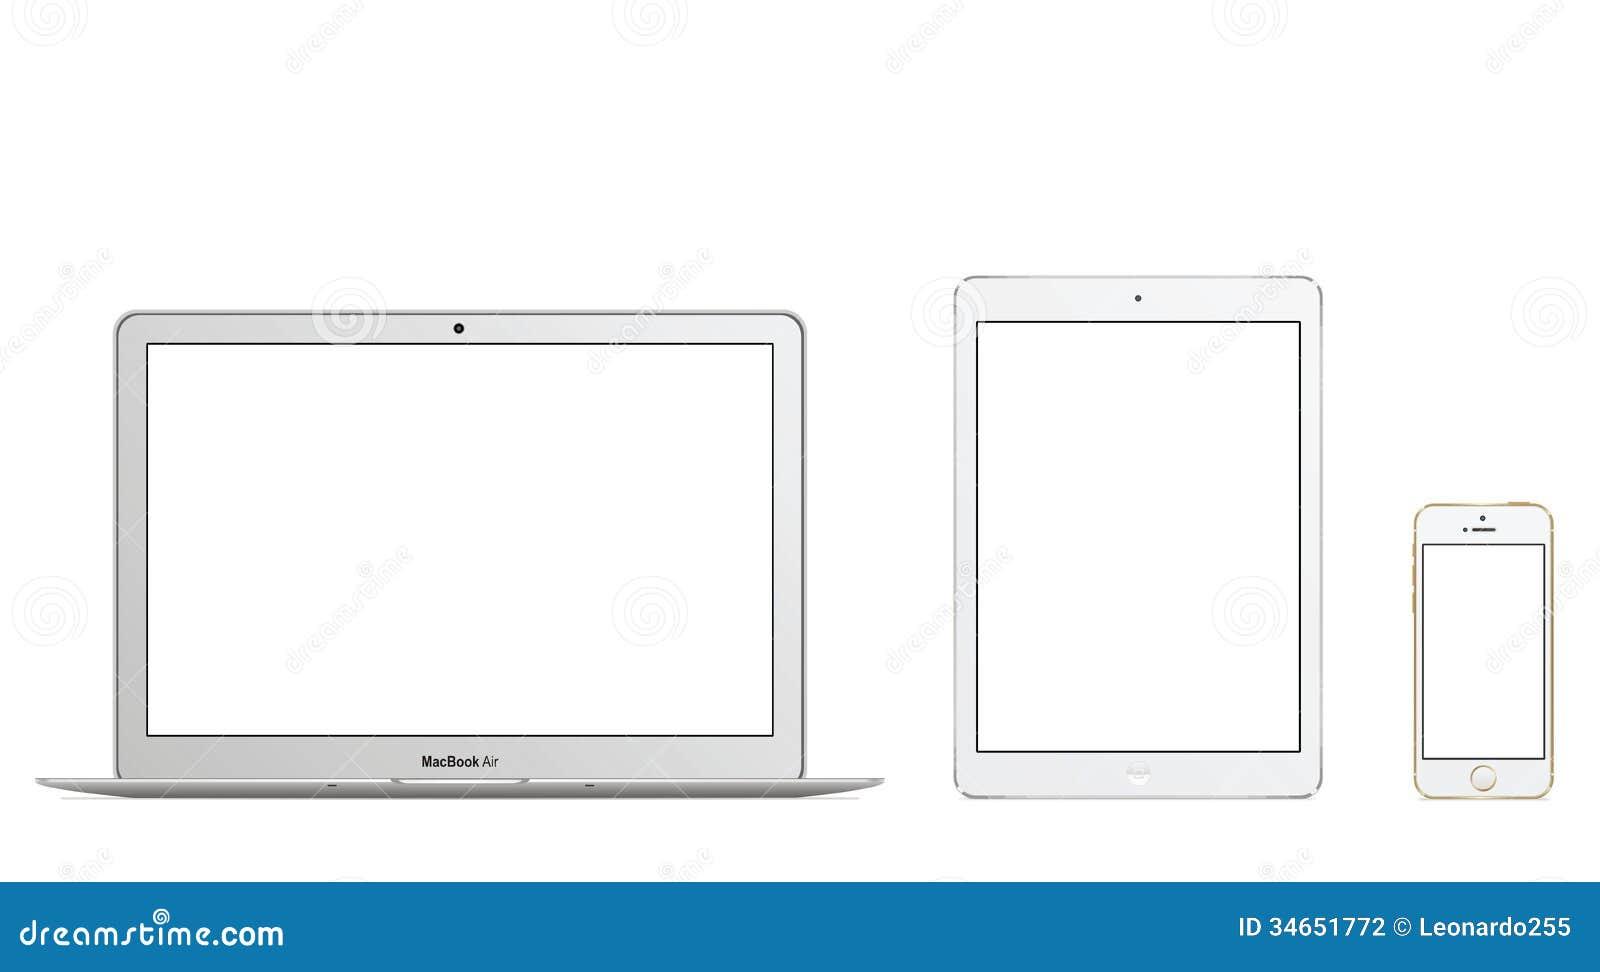 MacBook Air Ipad Air Iphone 5s